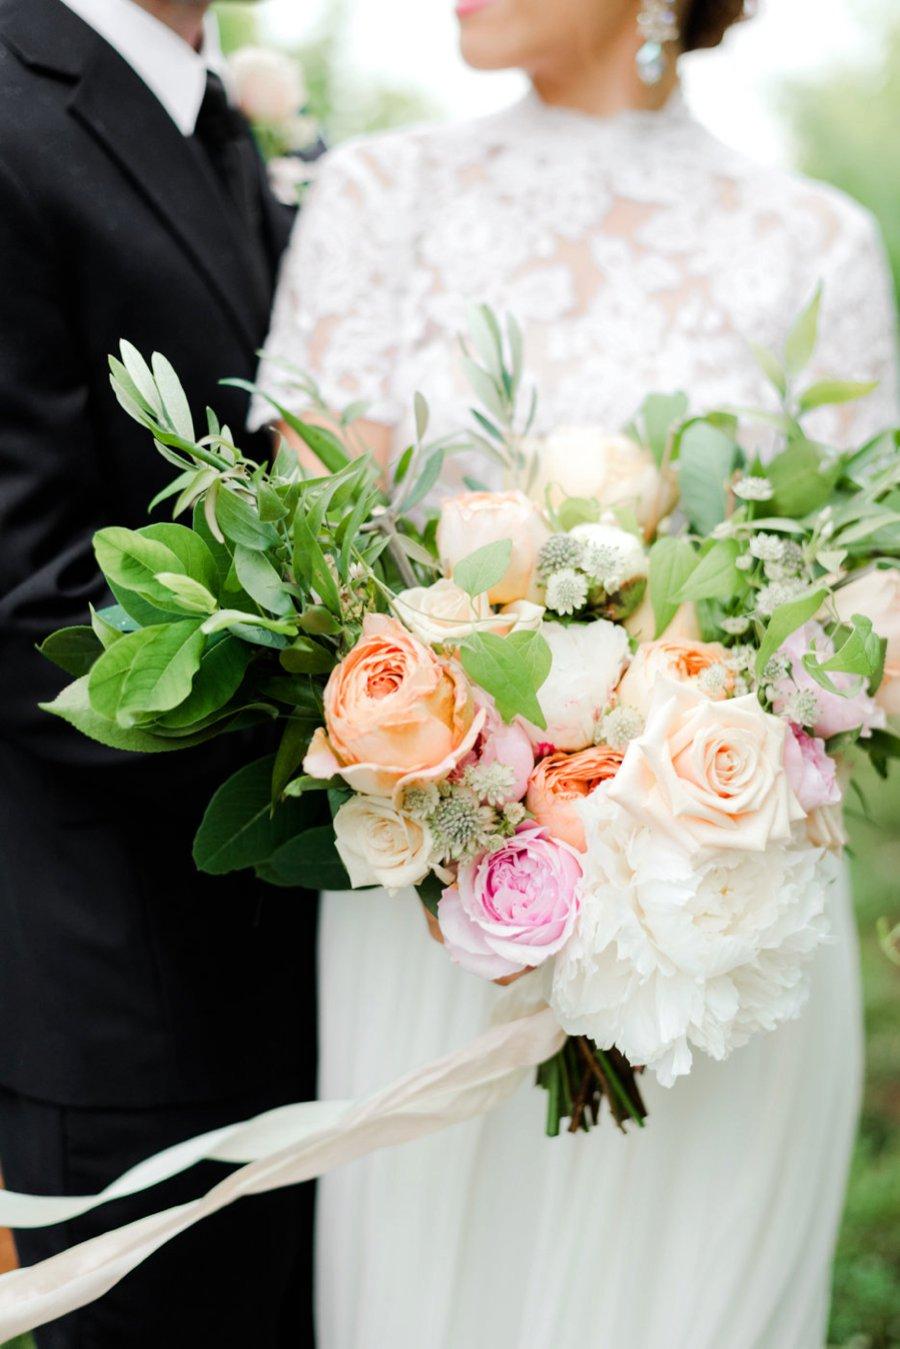 Gossamer wedding